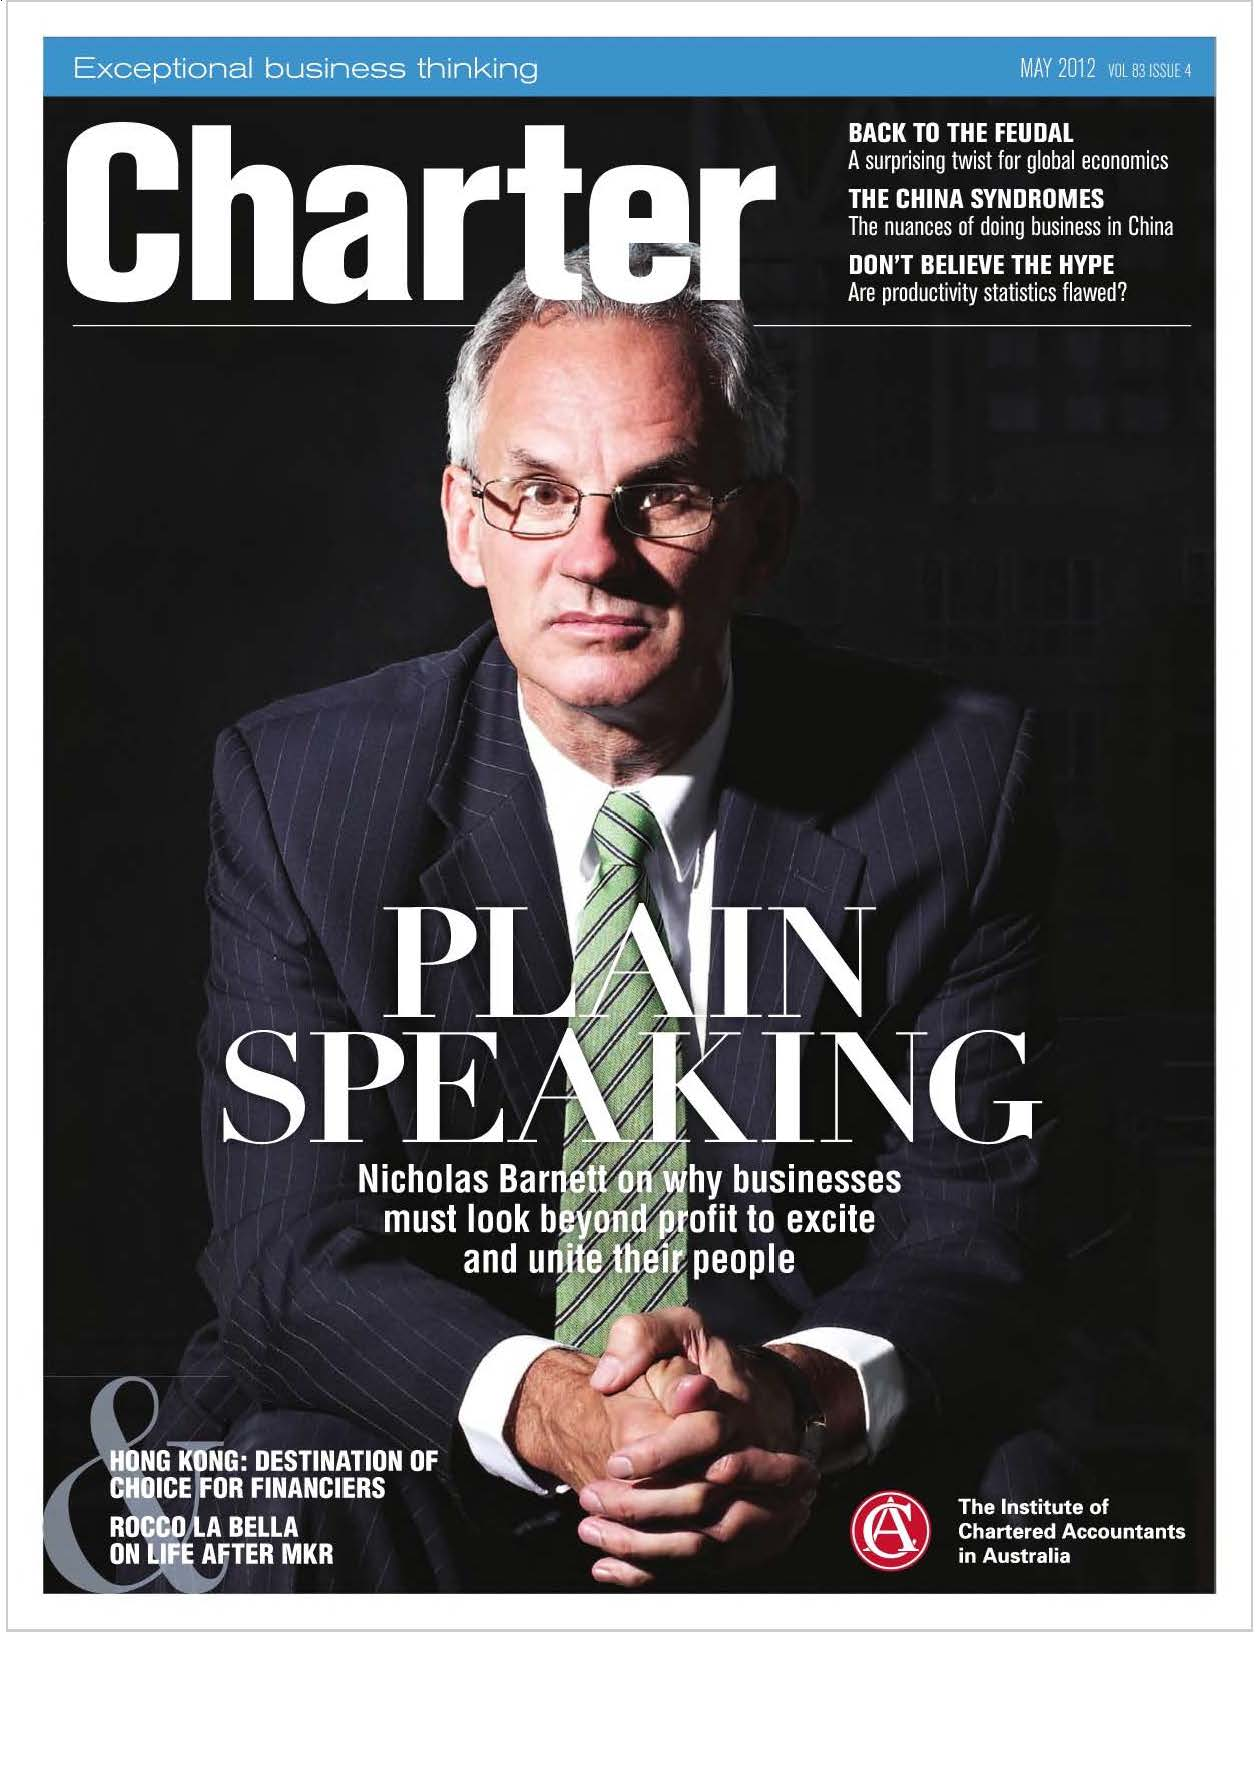 Charter magazine Aug 12 - Nicholas Barnett